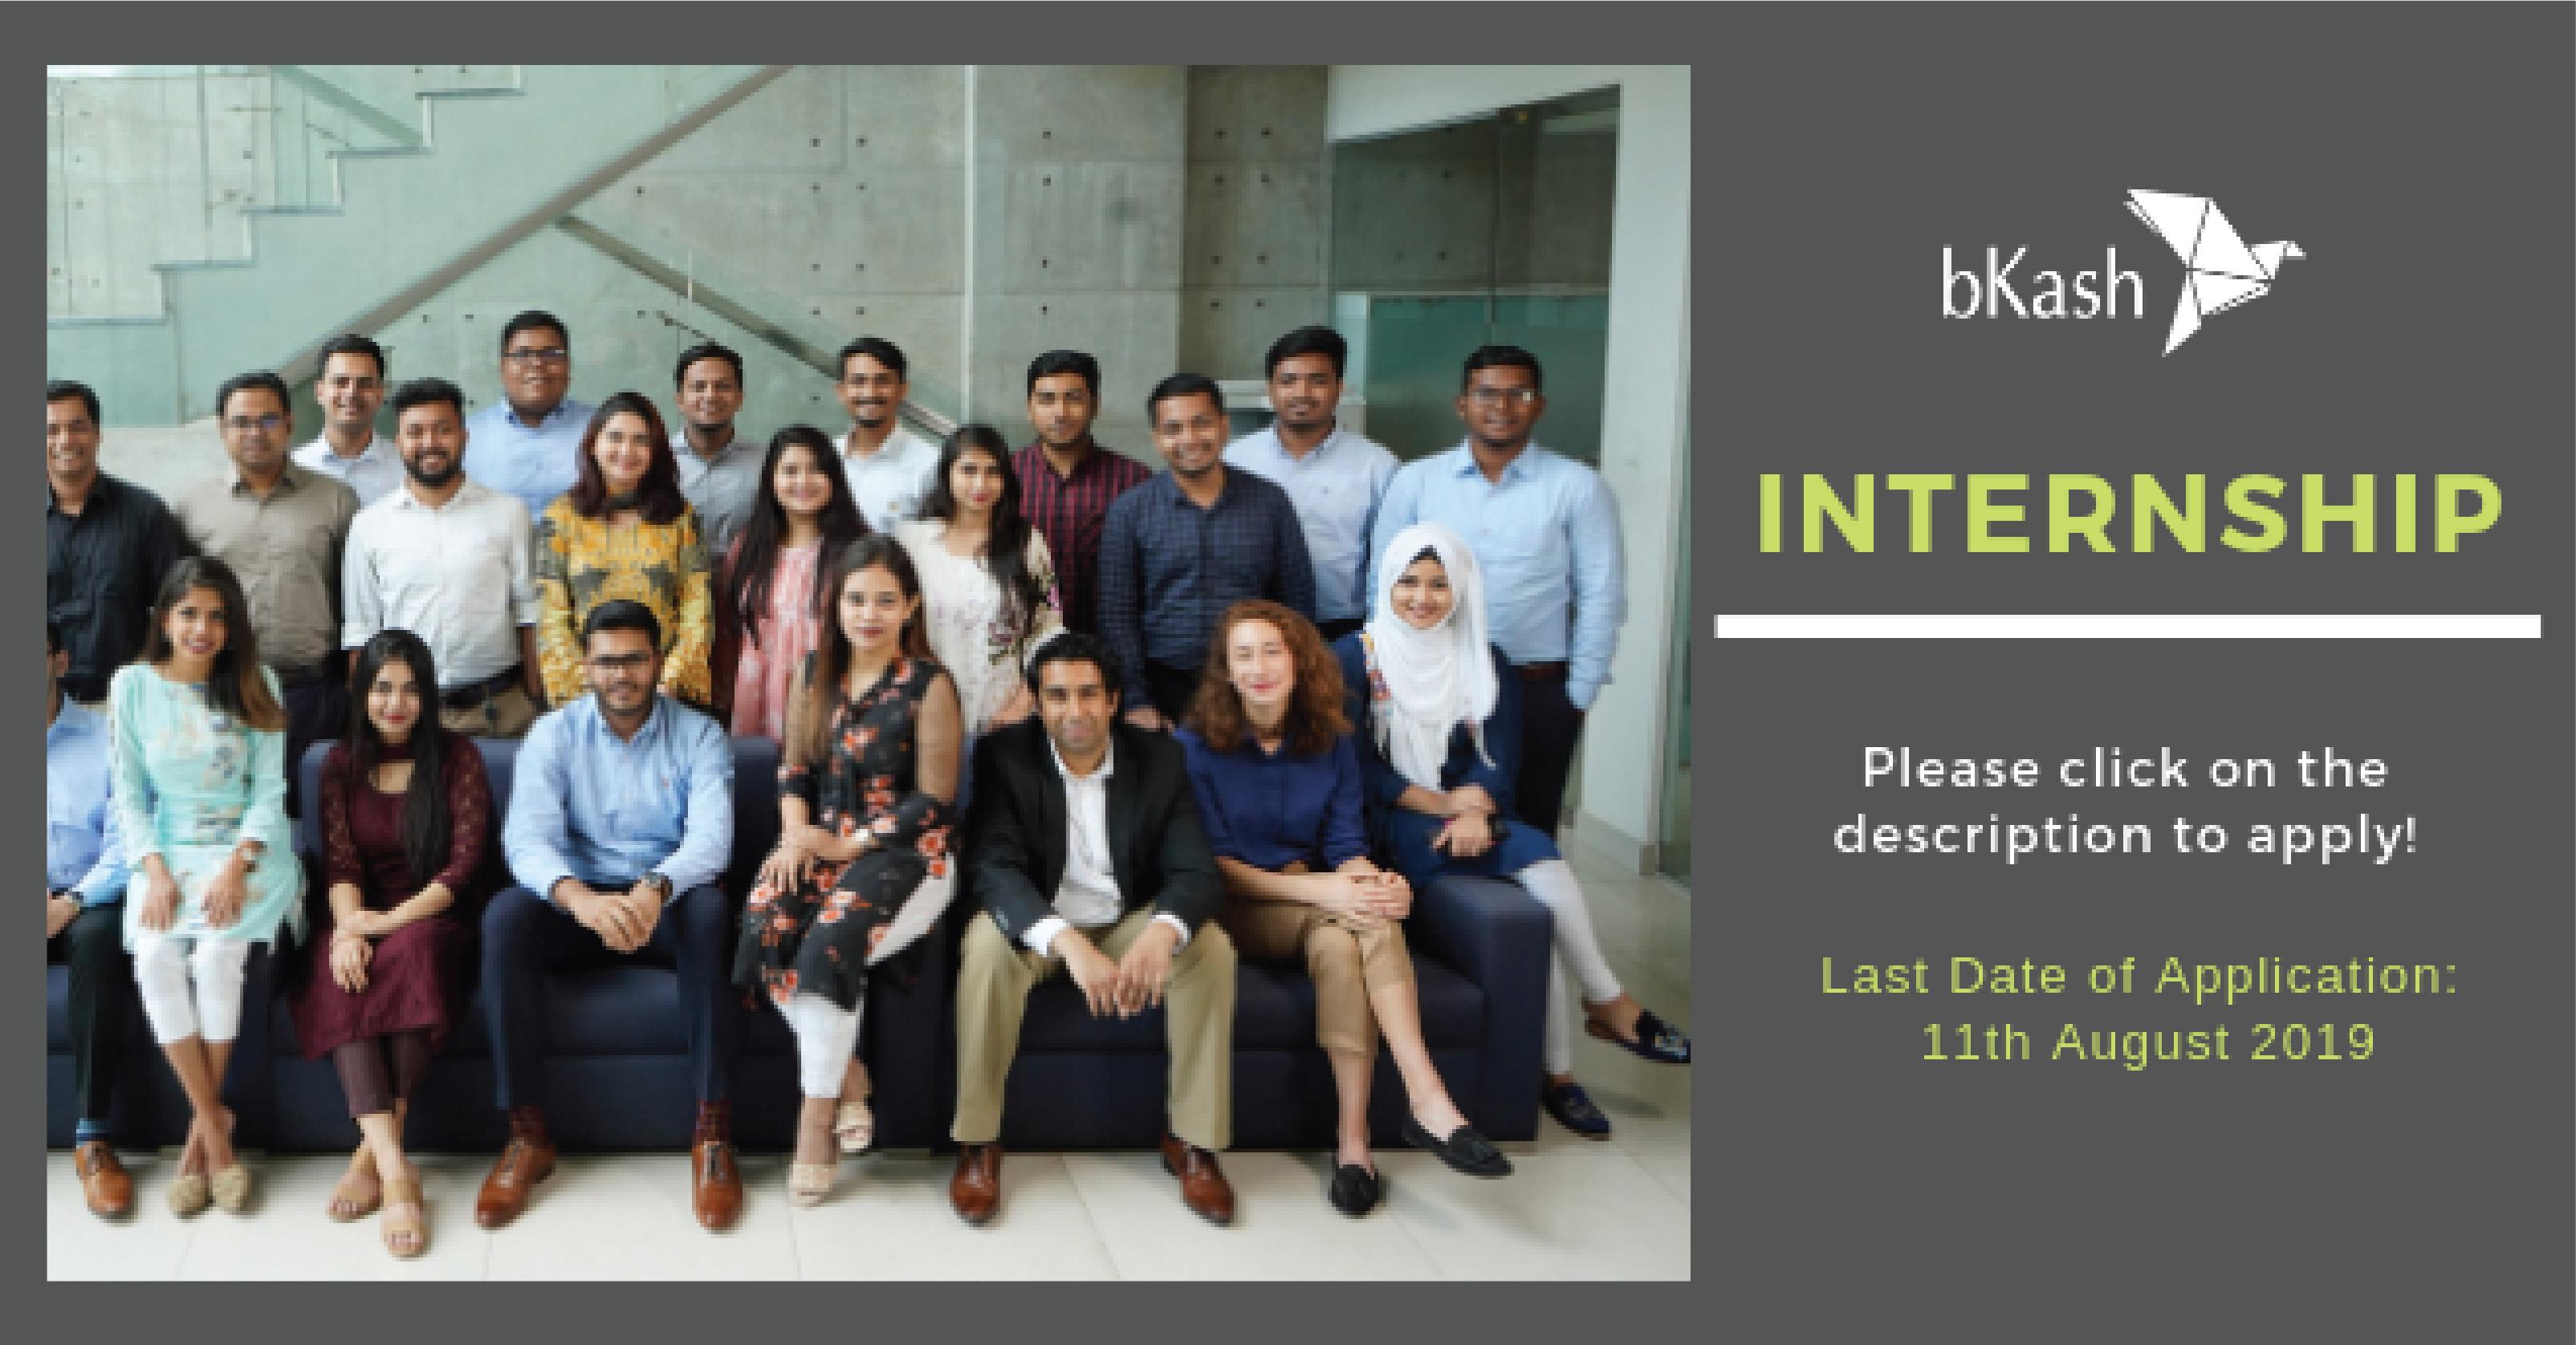 Fall Internship Opportunity in bKash  APPLY ASAP !